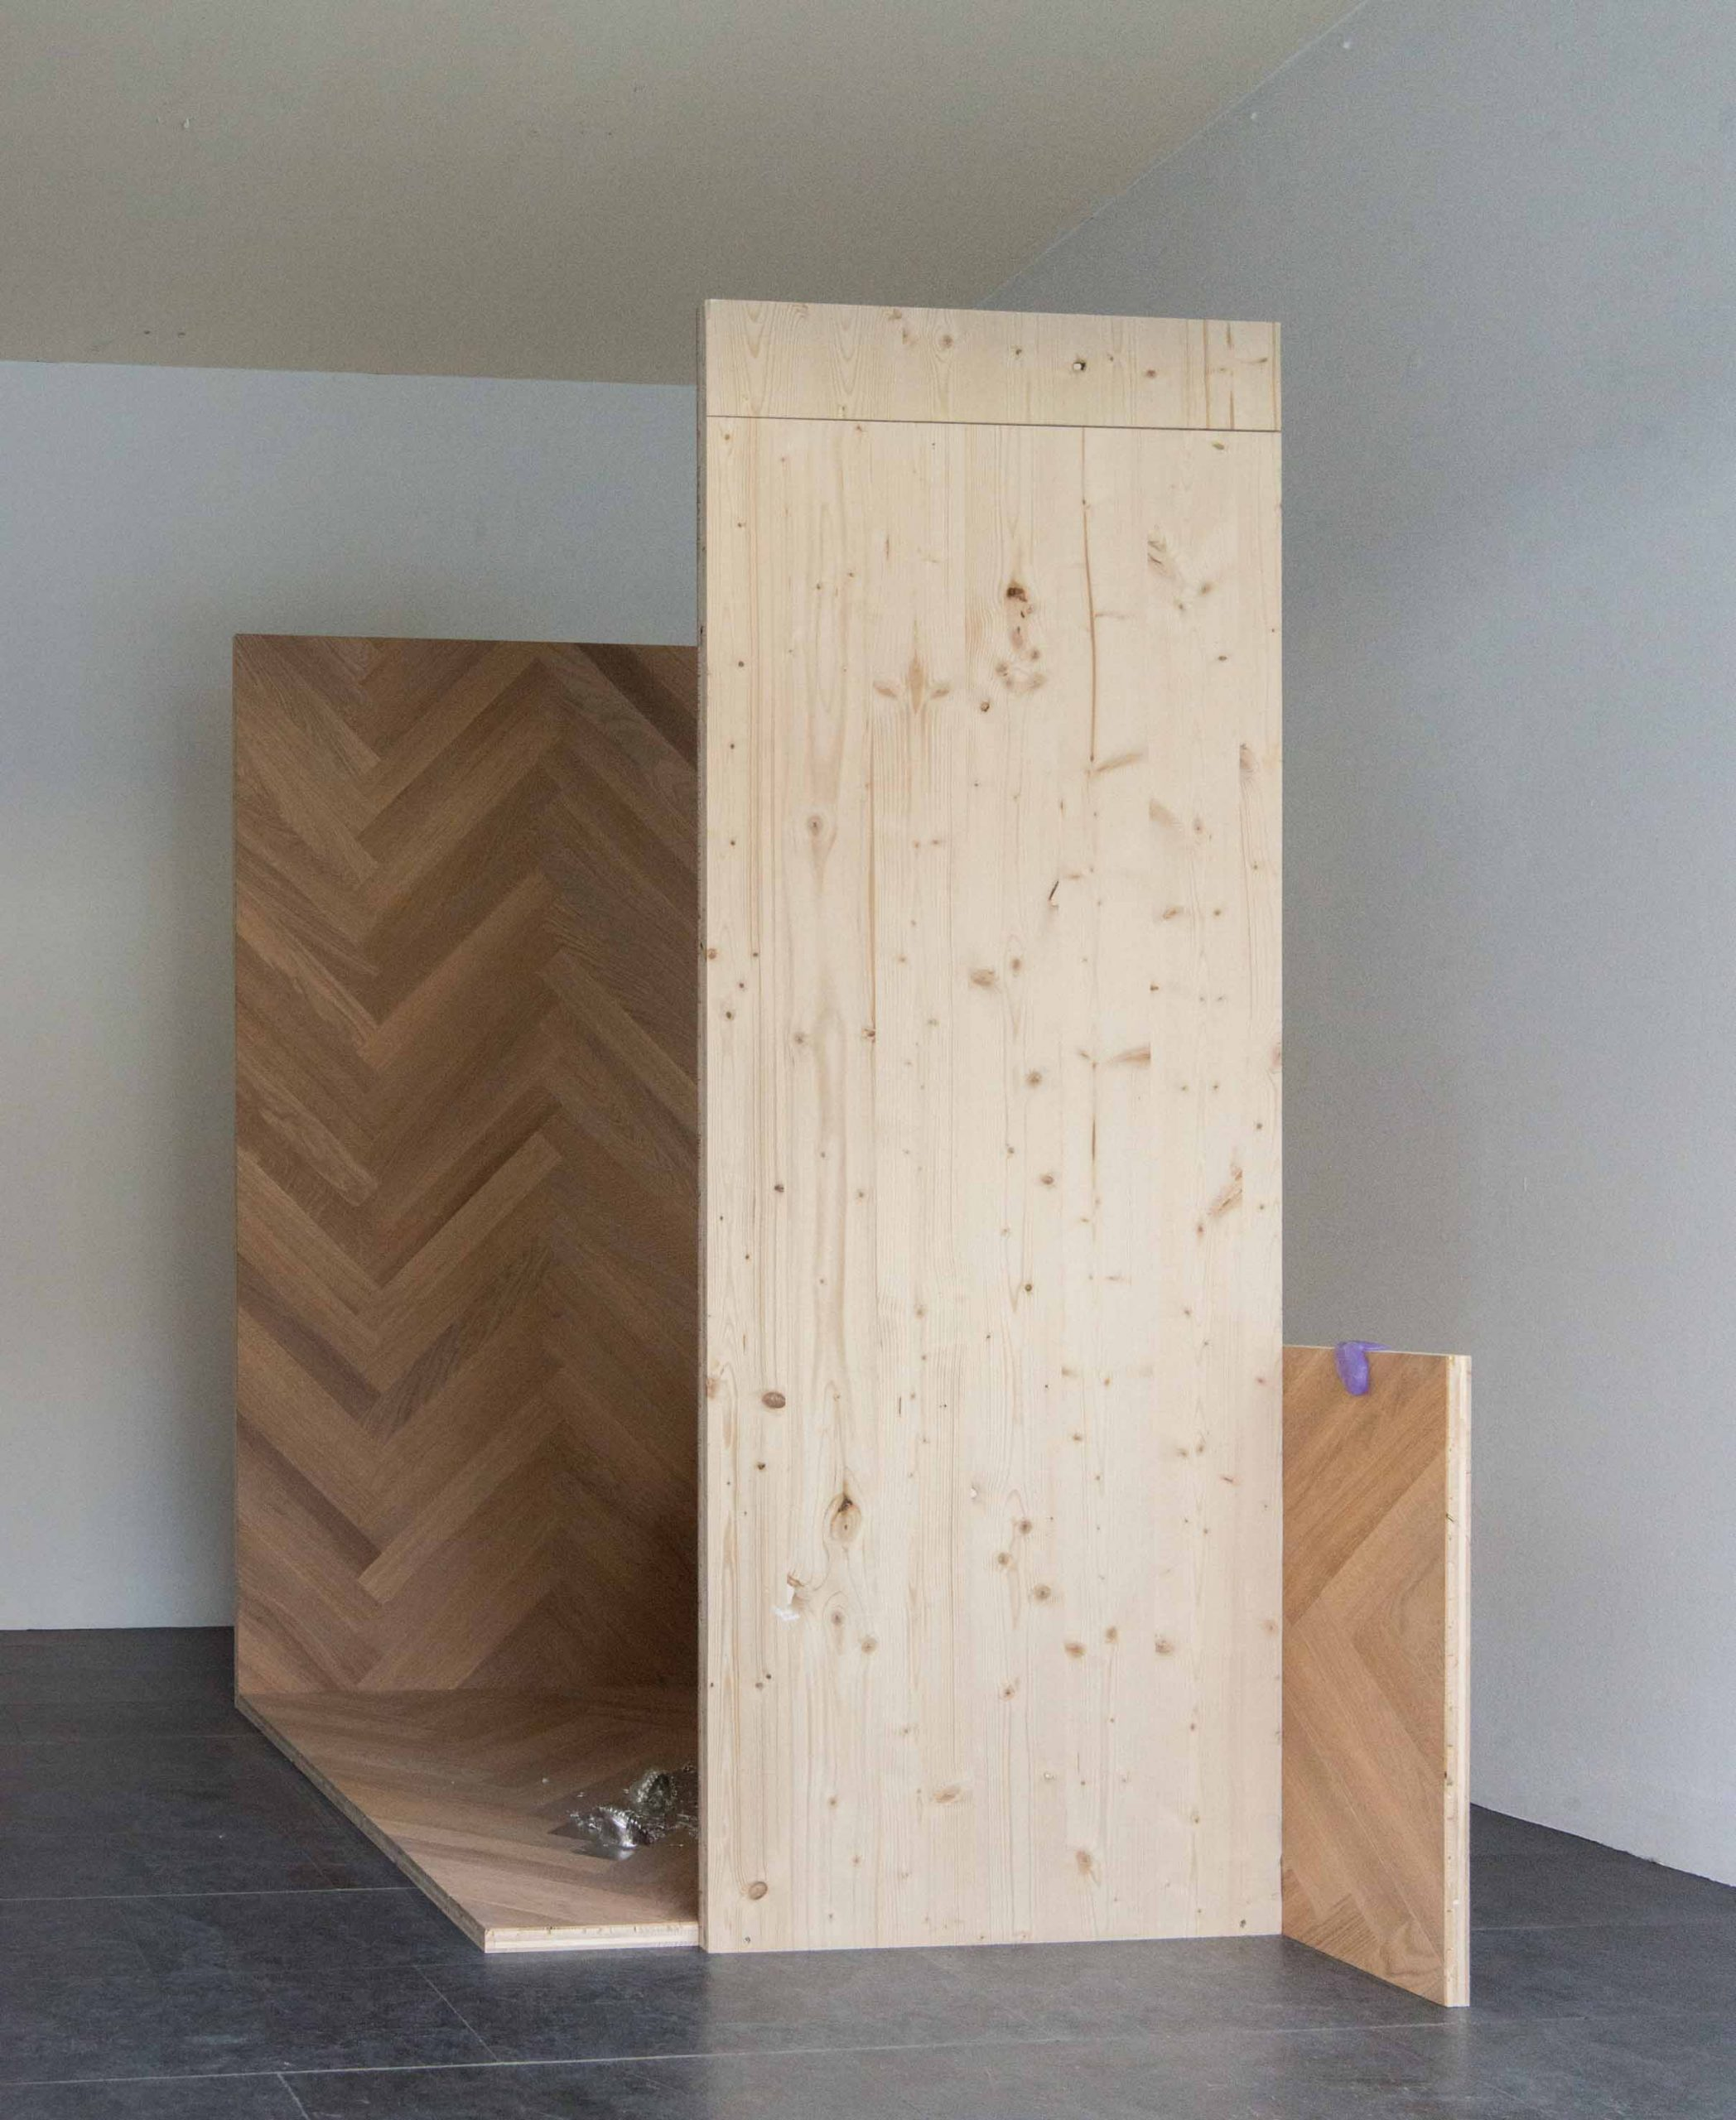 floor-work_Luka-Jana-Berchtold_2021_cSusanne-Reiterer-1